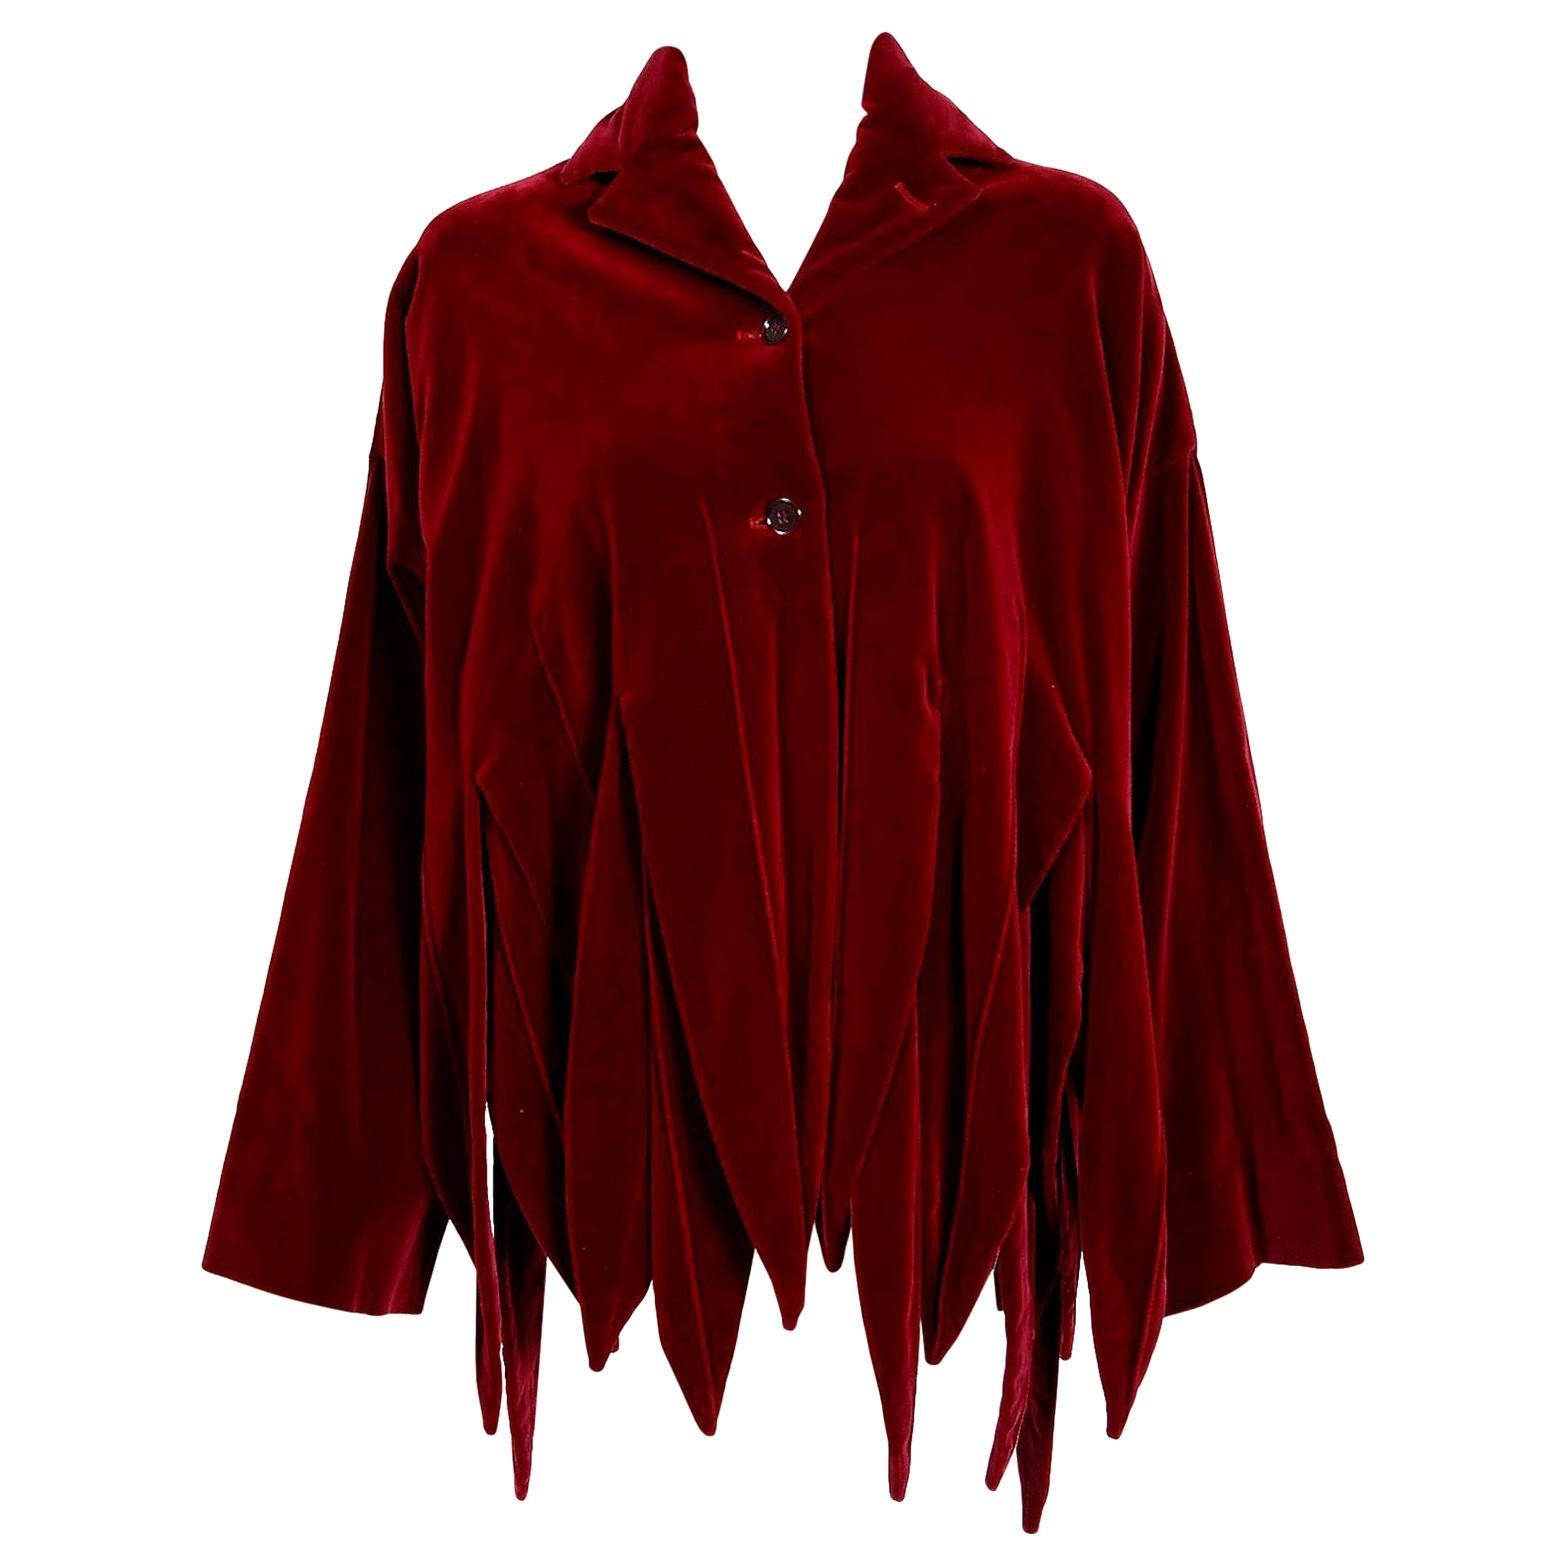 Vintage 1987 Romeo Gigli Museum-Held Red Velvet Jester Petal Swing Coat Jacket